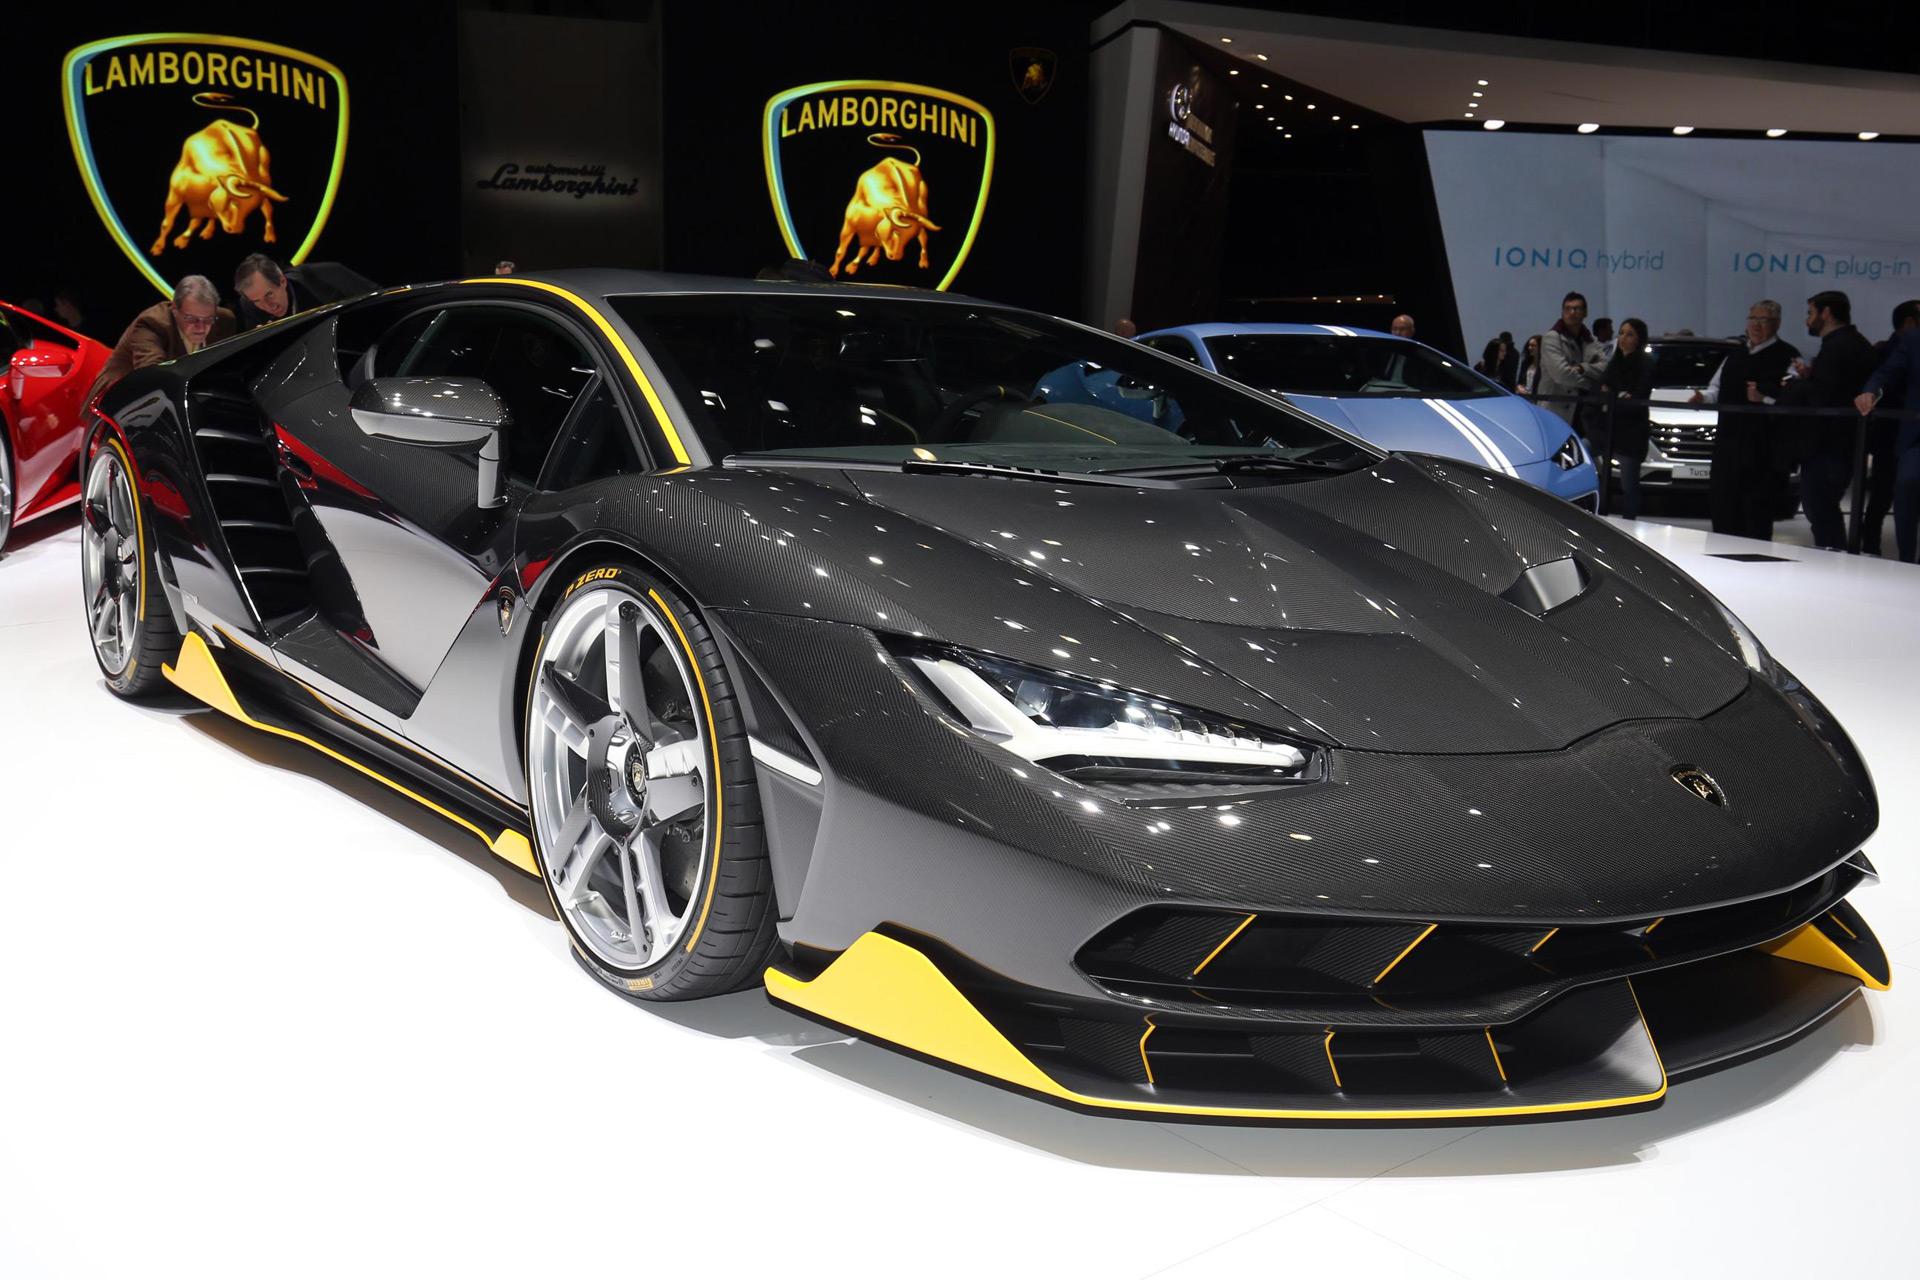 Lamborghini Centenario Debuts In Geneva With 759 Hp